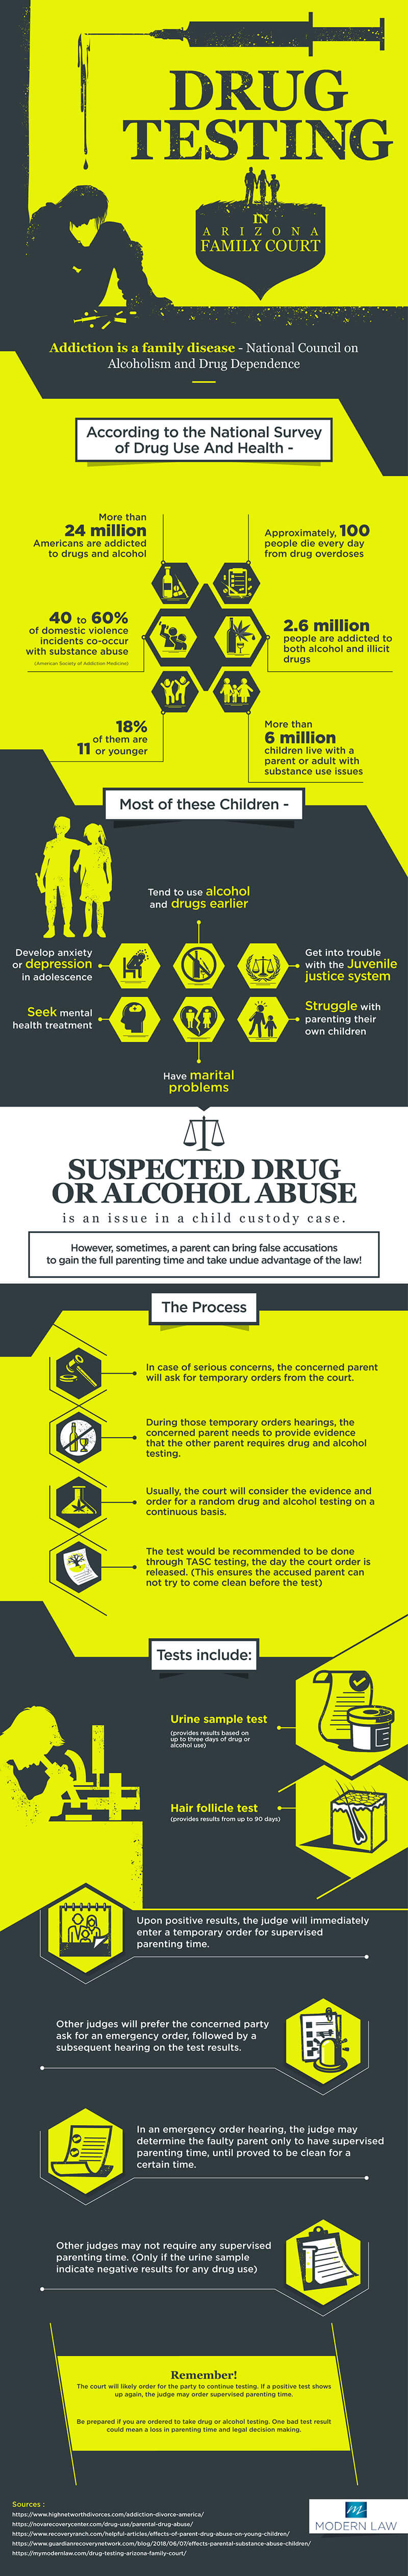 Drug Testing in Arizona Family Court